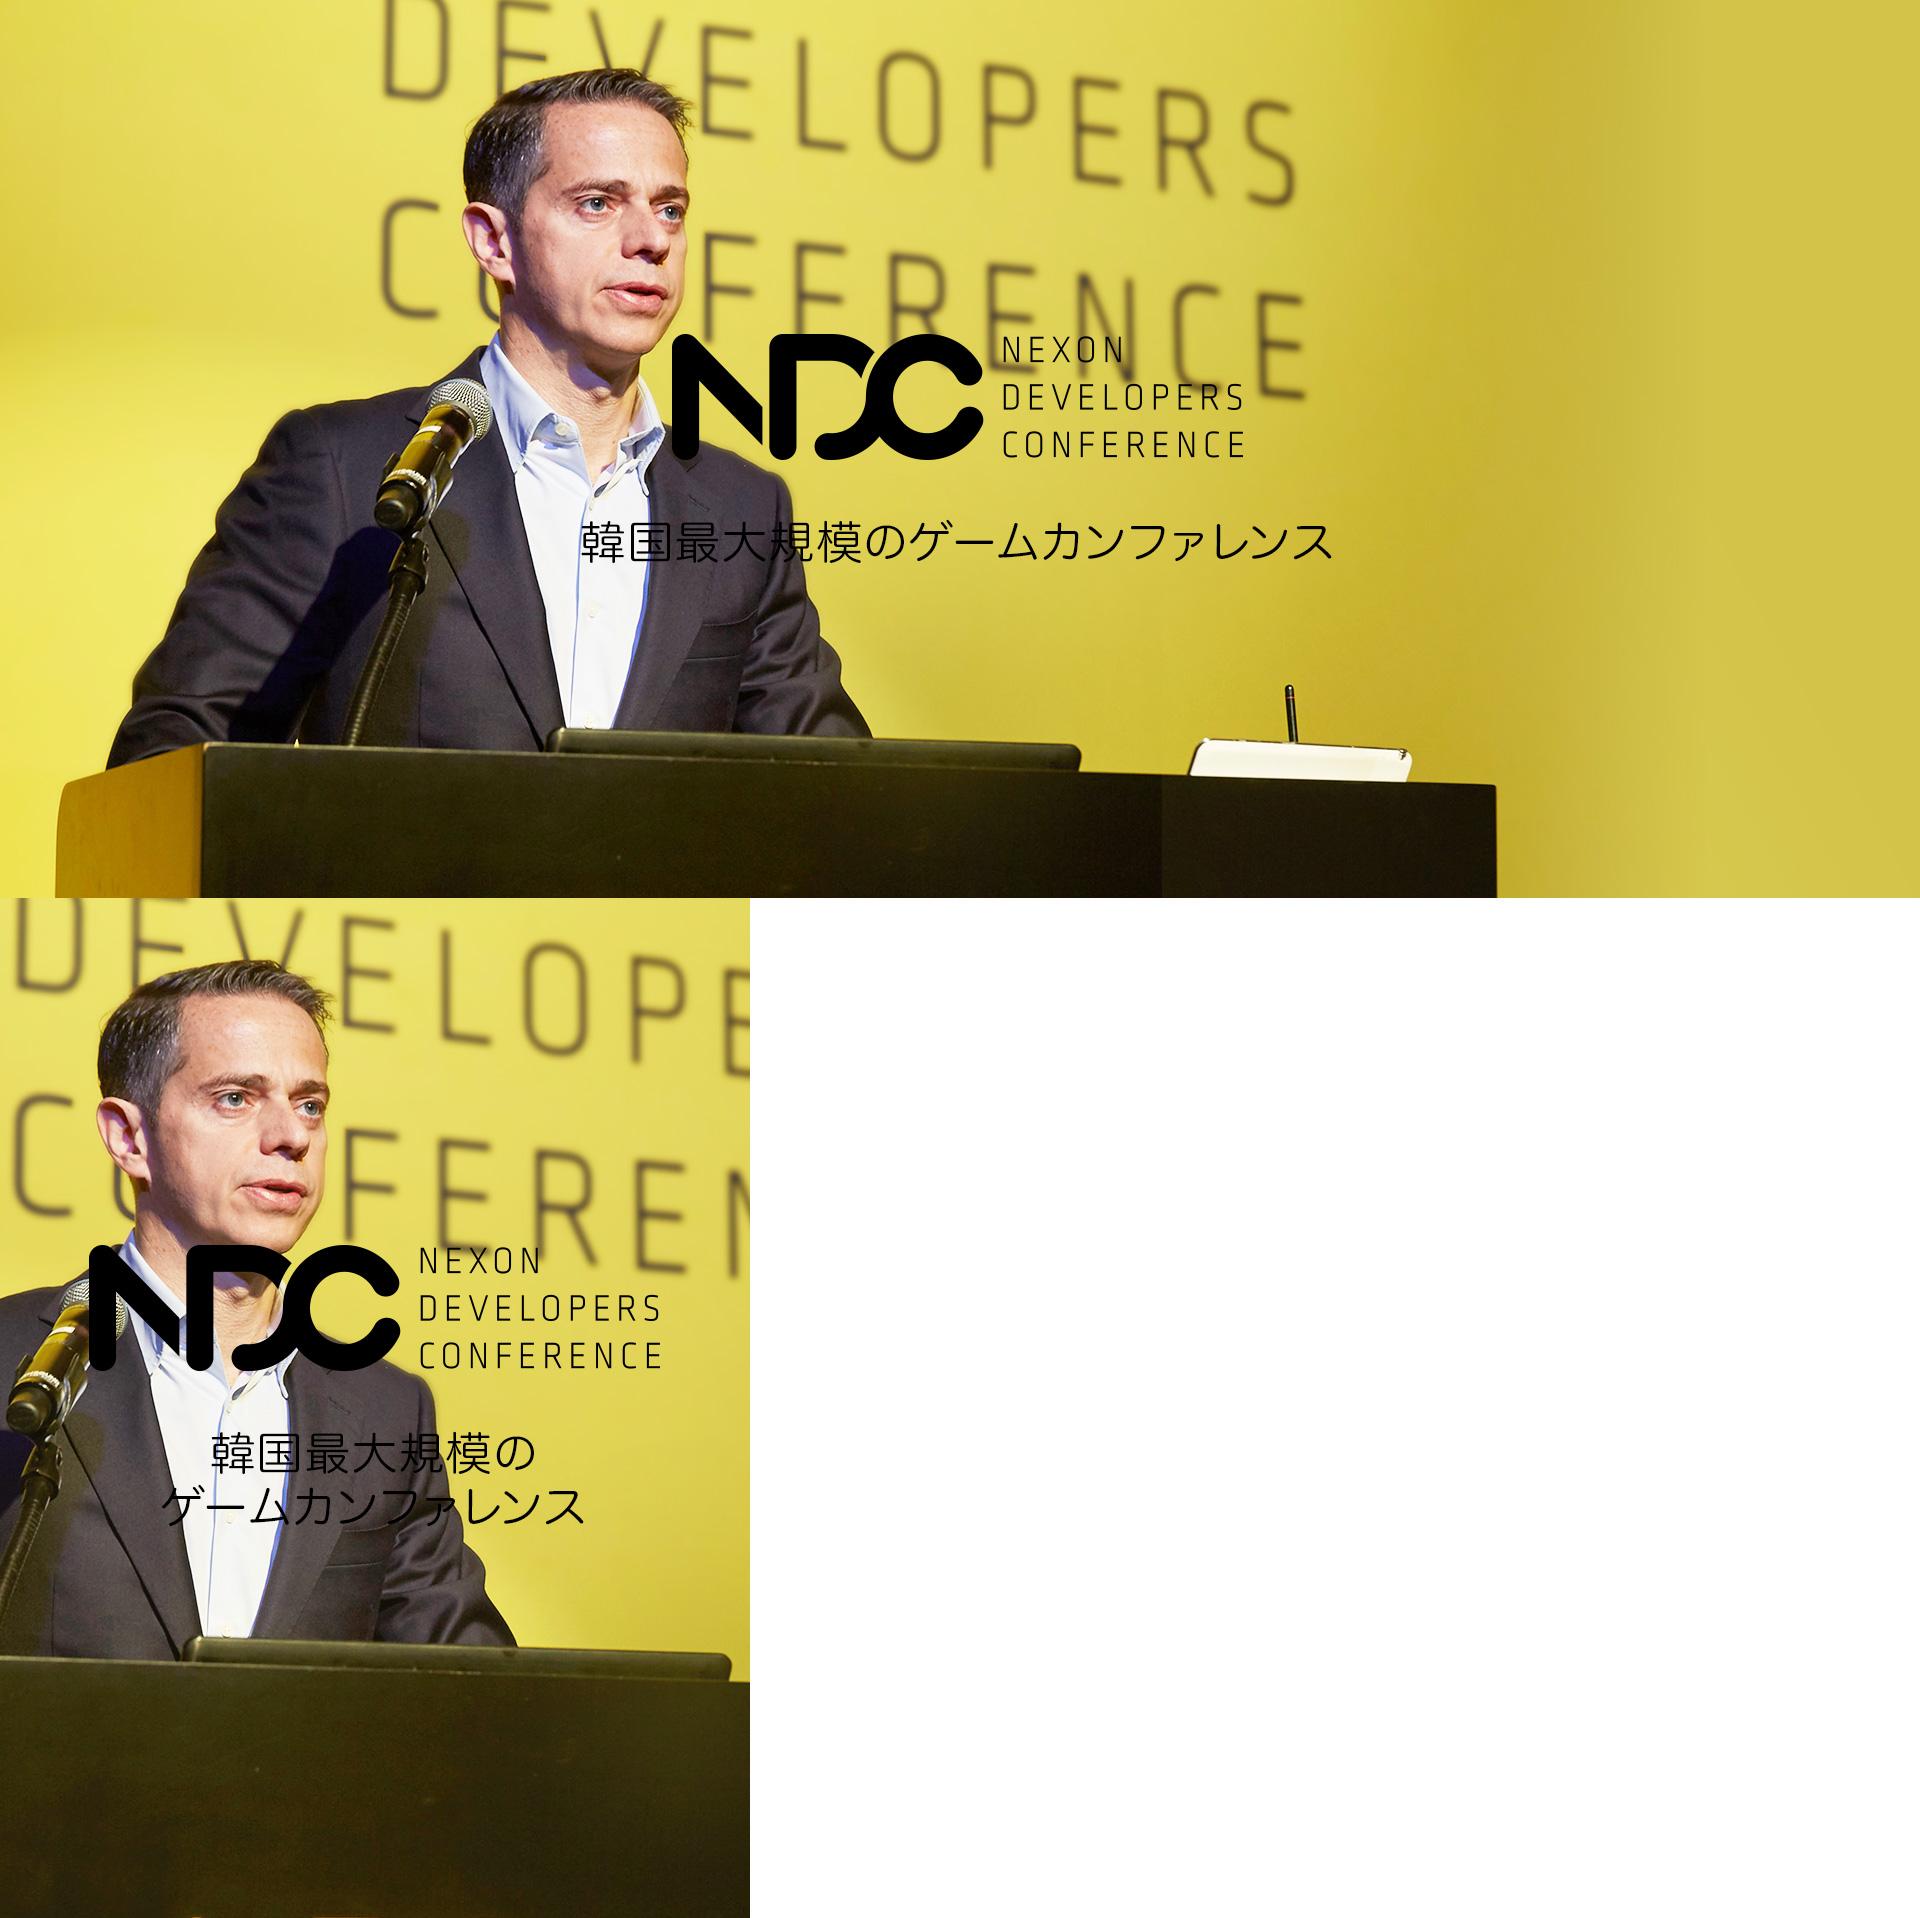 Nexon Developers Conference (NDC)